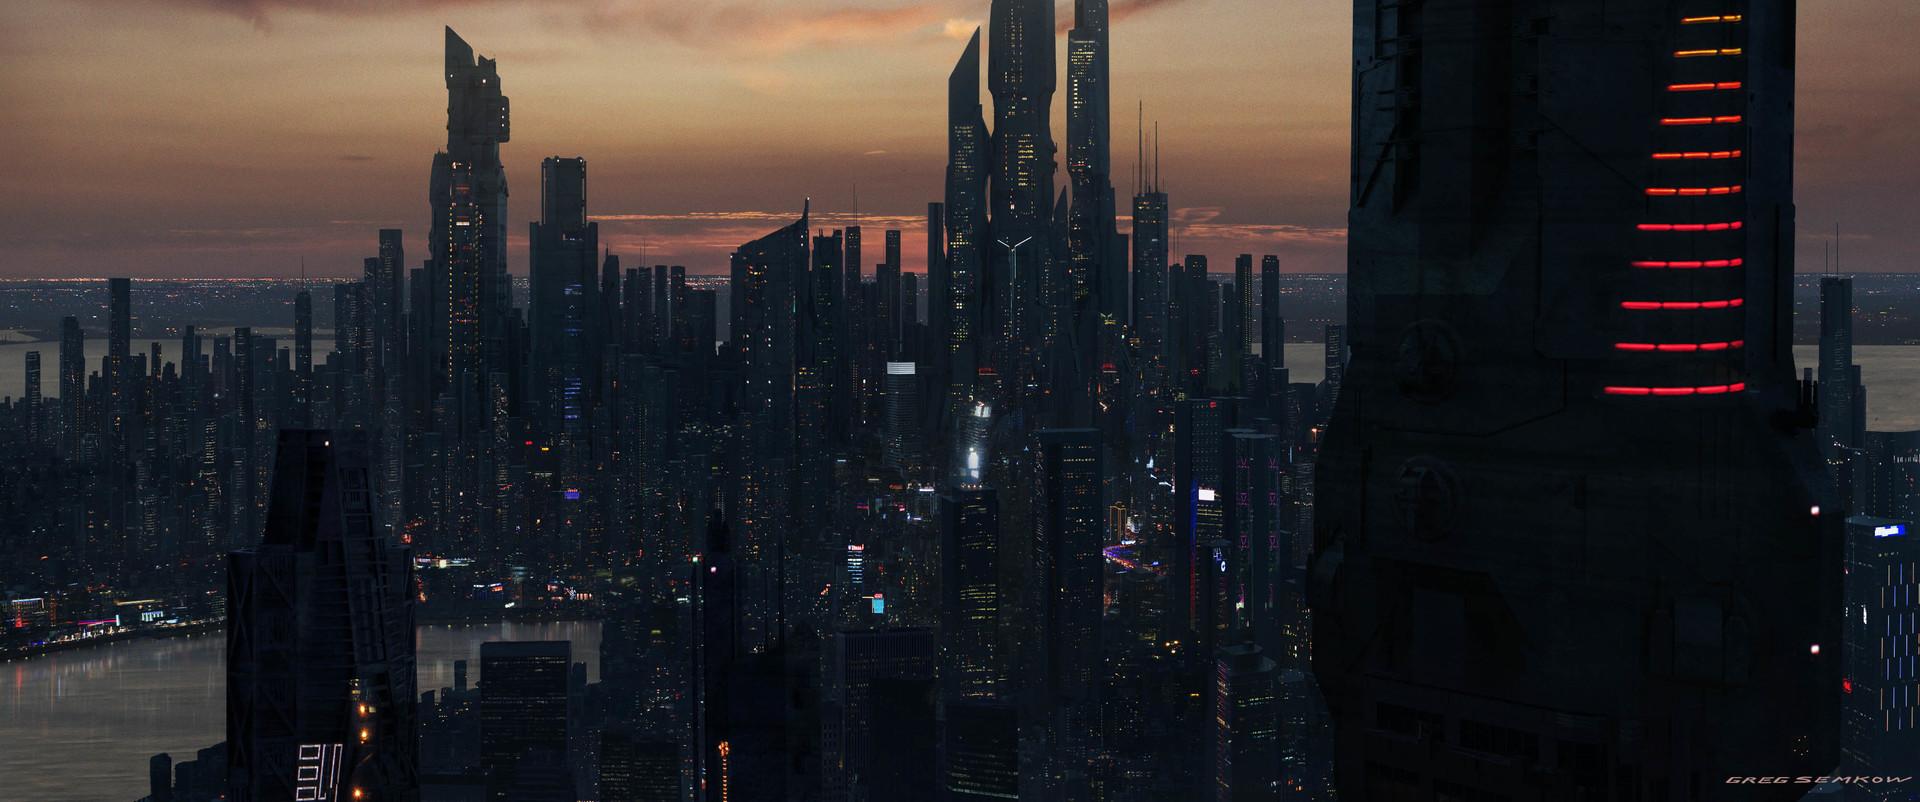 Cityscape exploration